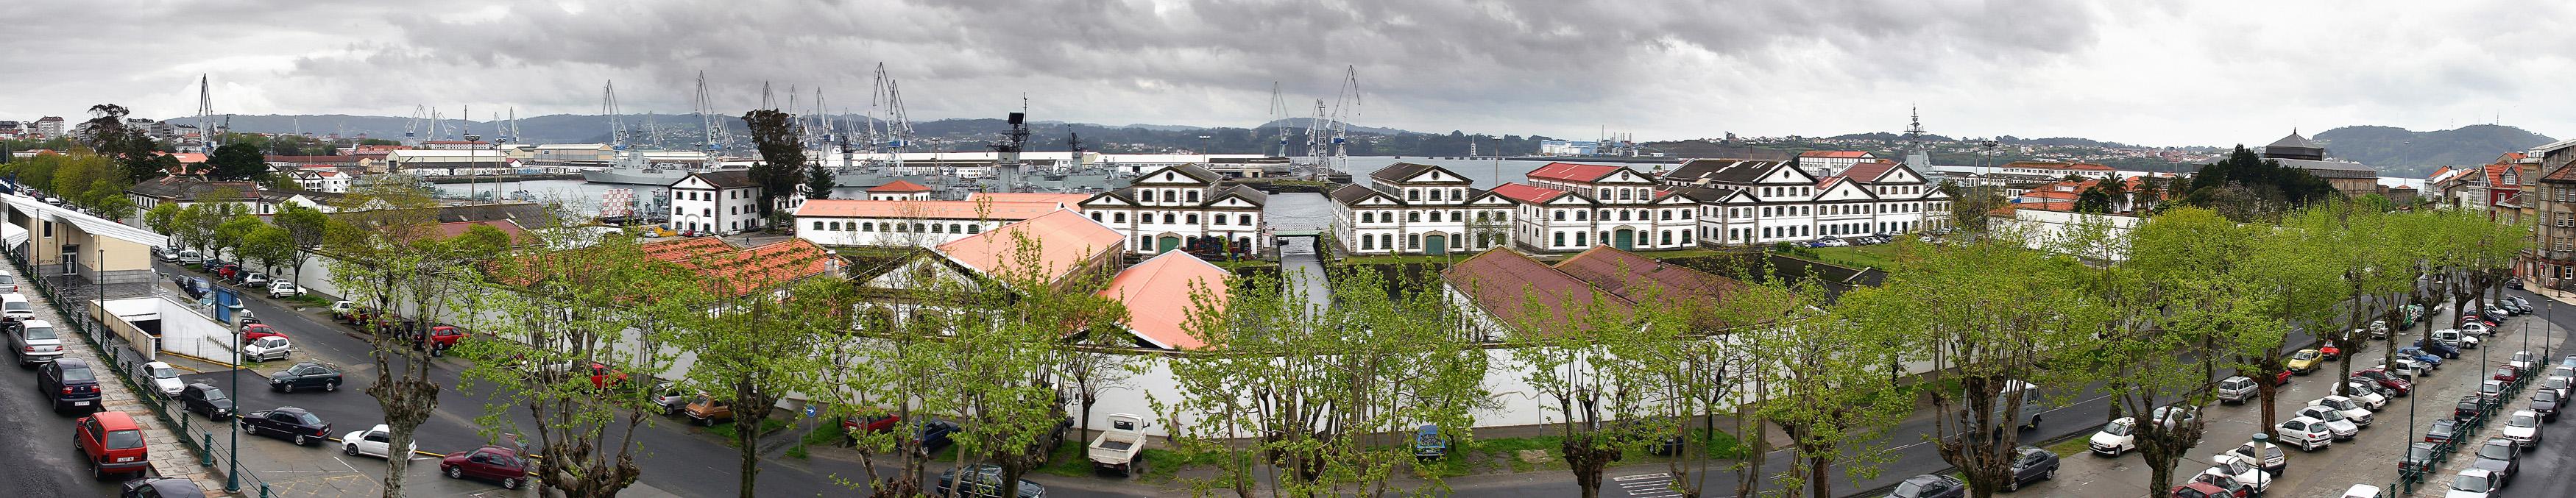 Ferrol Port (Galiza, Spain)